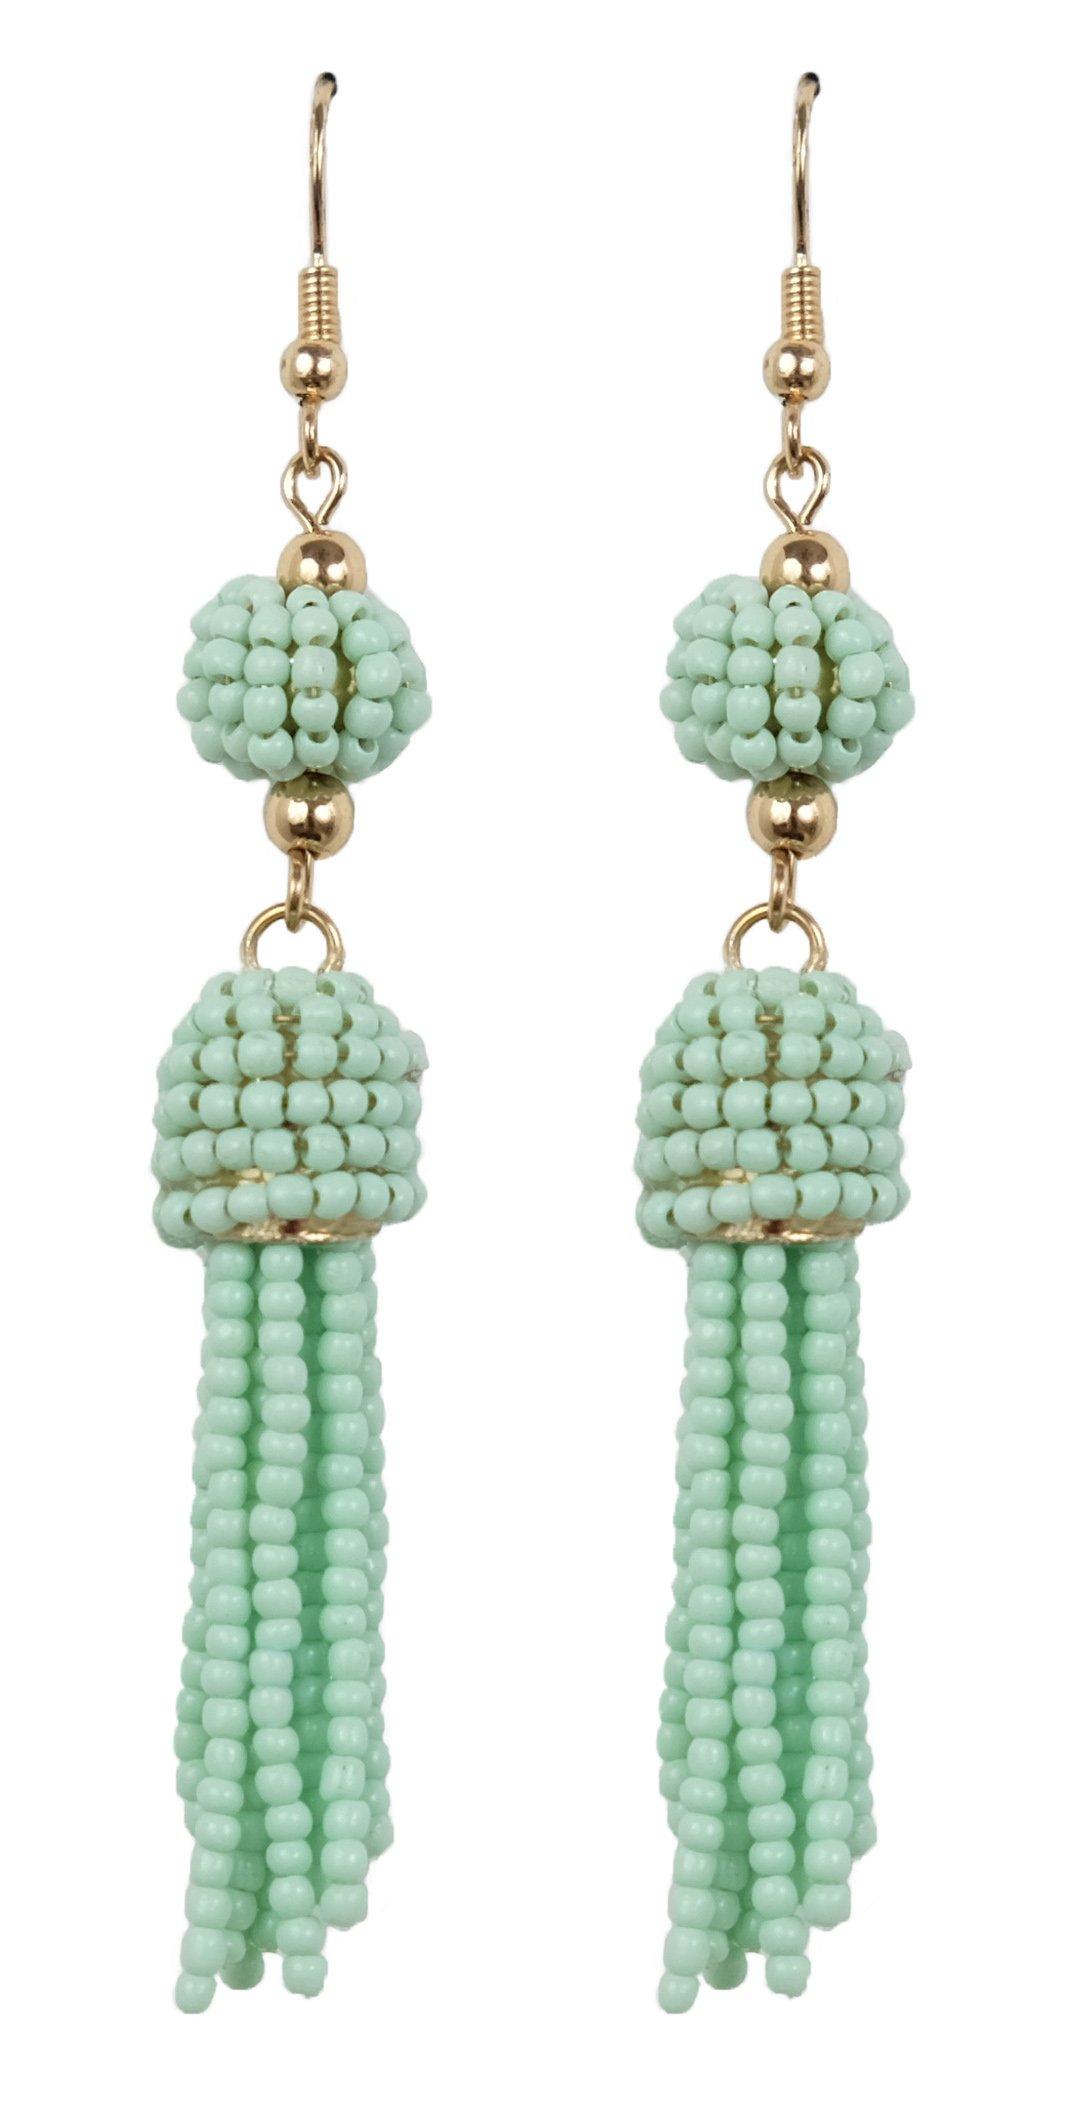 Bee Wee Jewelry Casablanca Beaded Ball and Tassel Earrings - Bon Bon Seed Beaded Ball Dangle Bubble Boho Bohemian Fringe Dainty Silver Gold Ear Drop Soriee Statement Dangles (Turquoise)